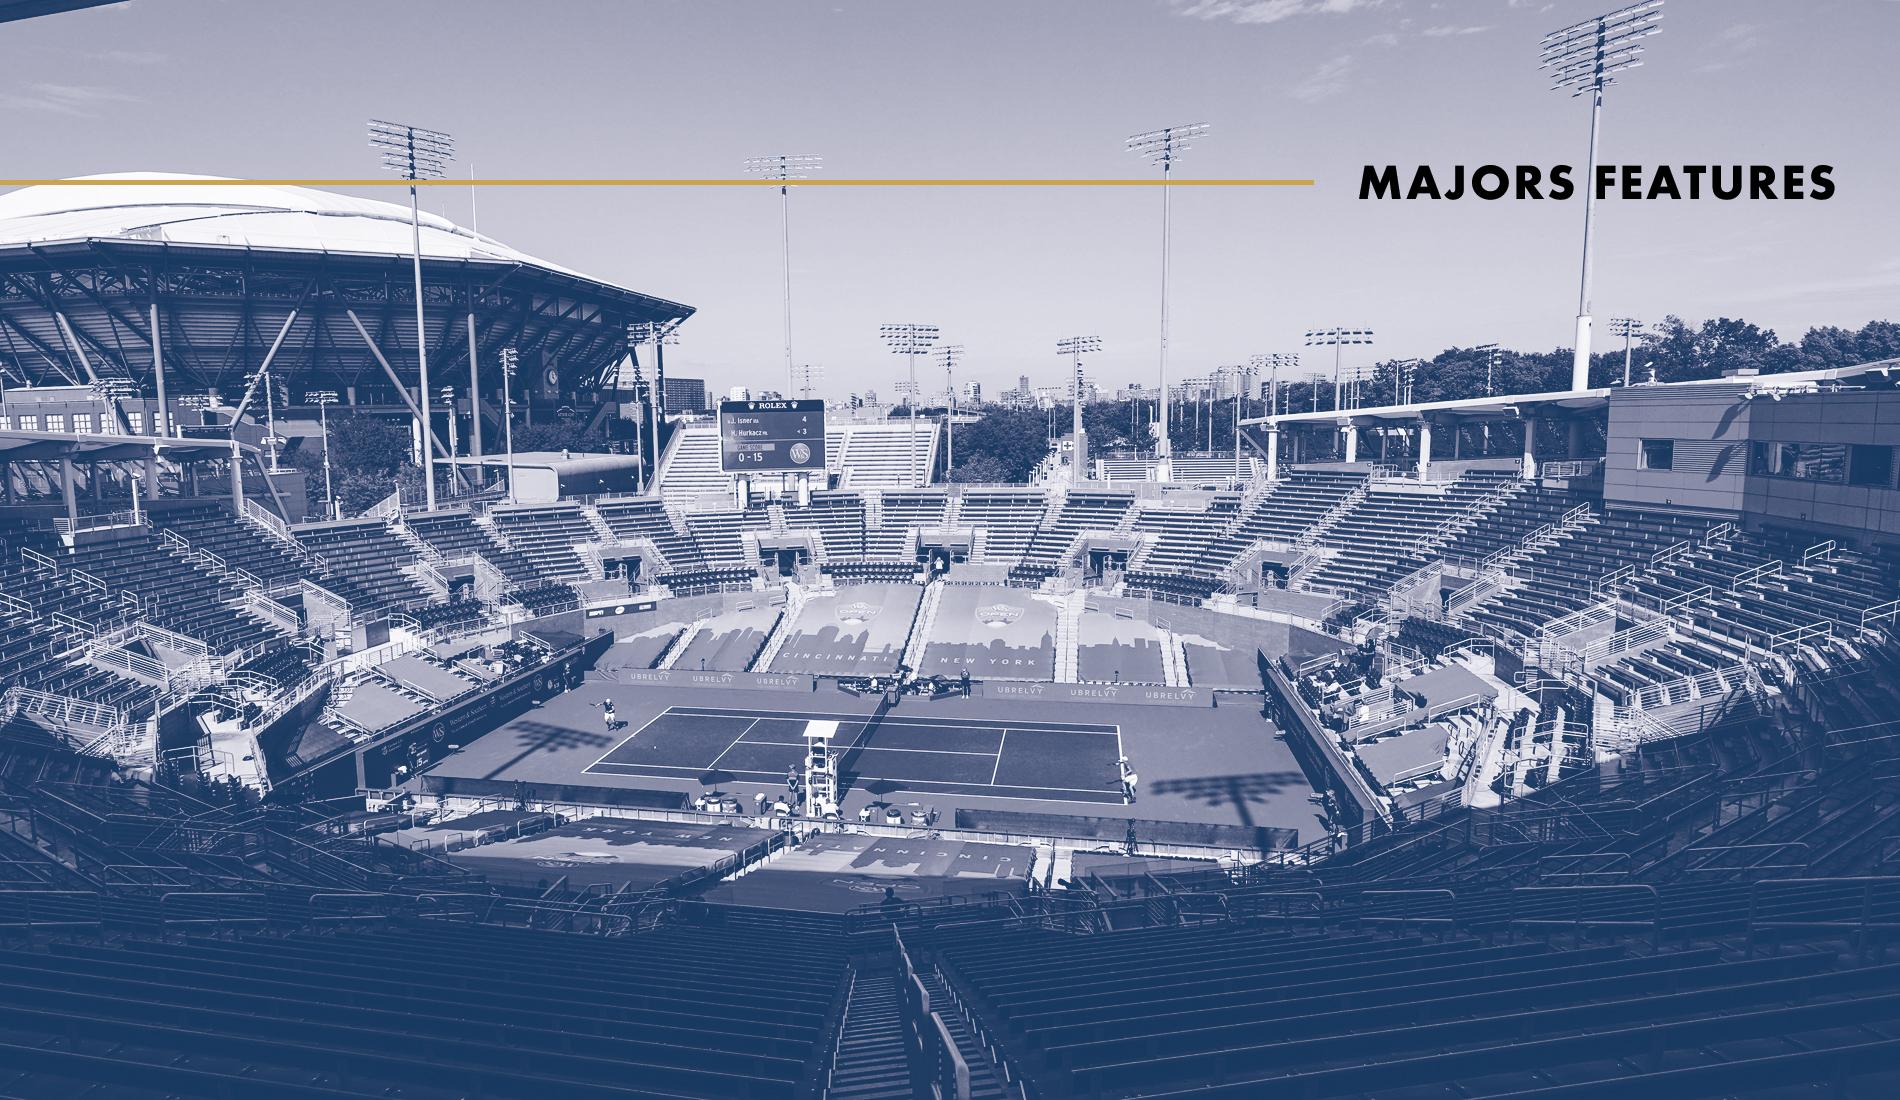 US Open 2020 behind closed doors (Tennis Majors Feature)